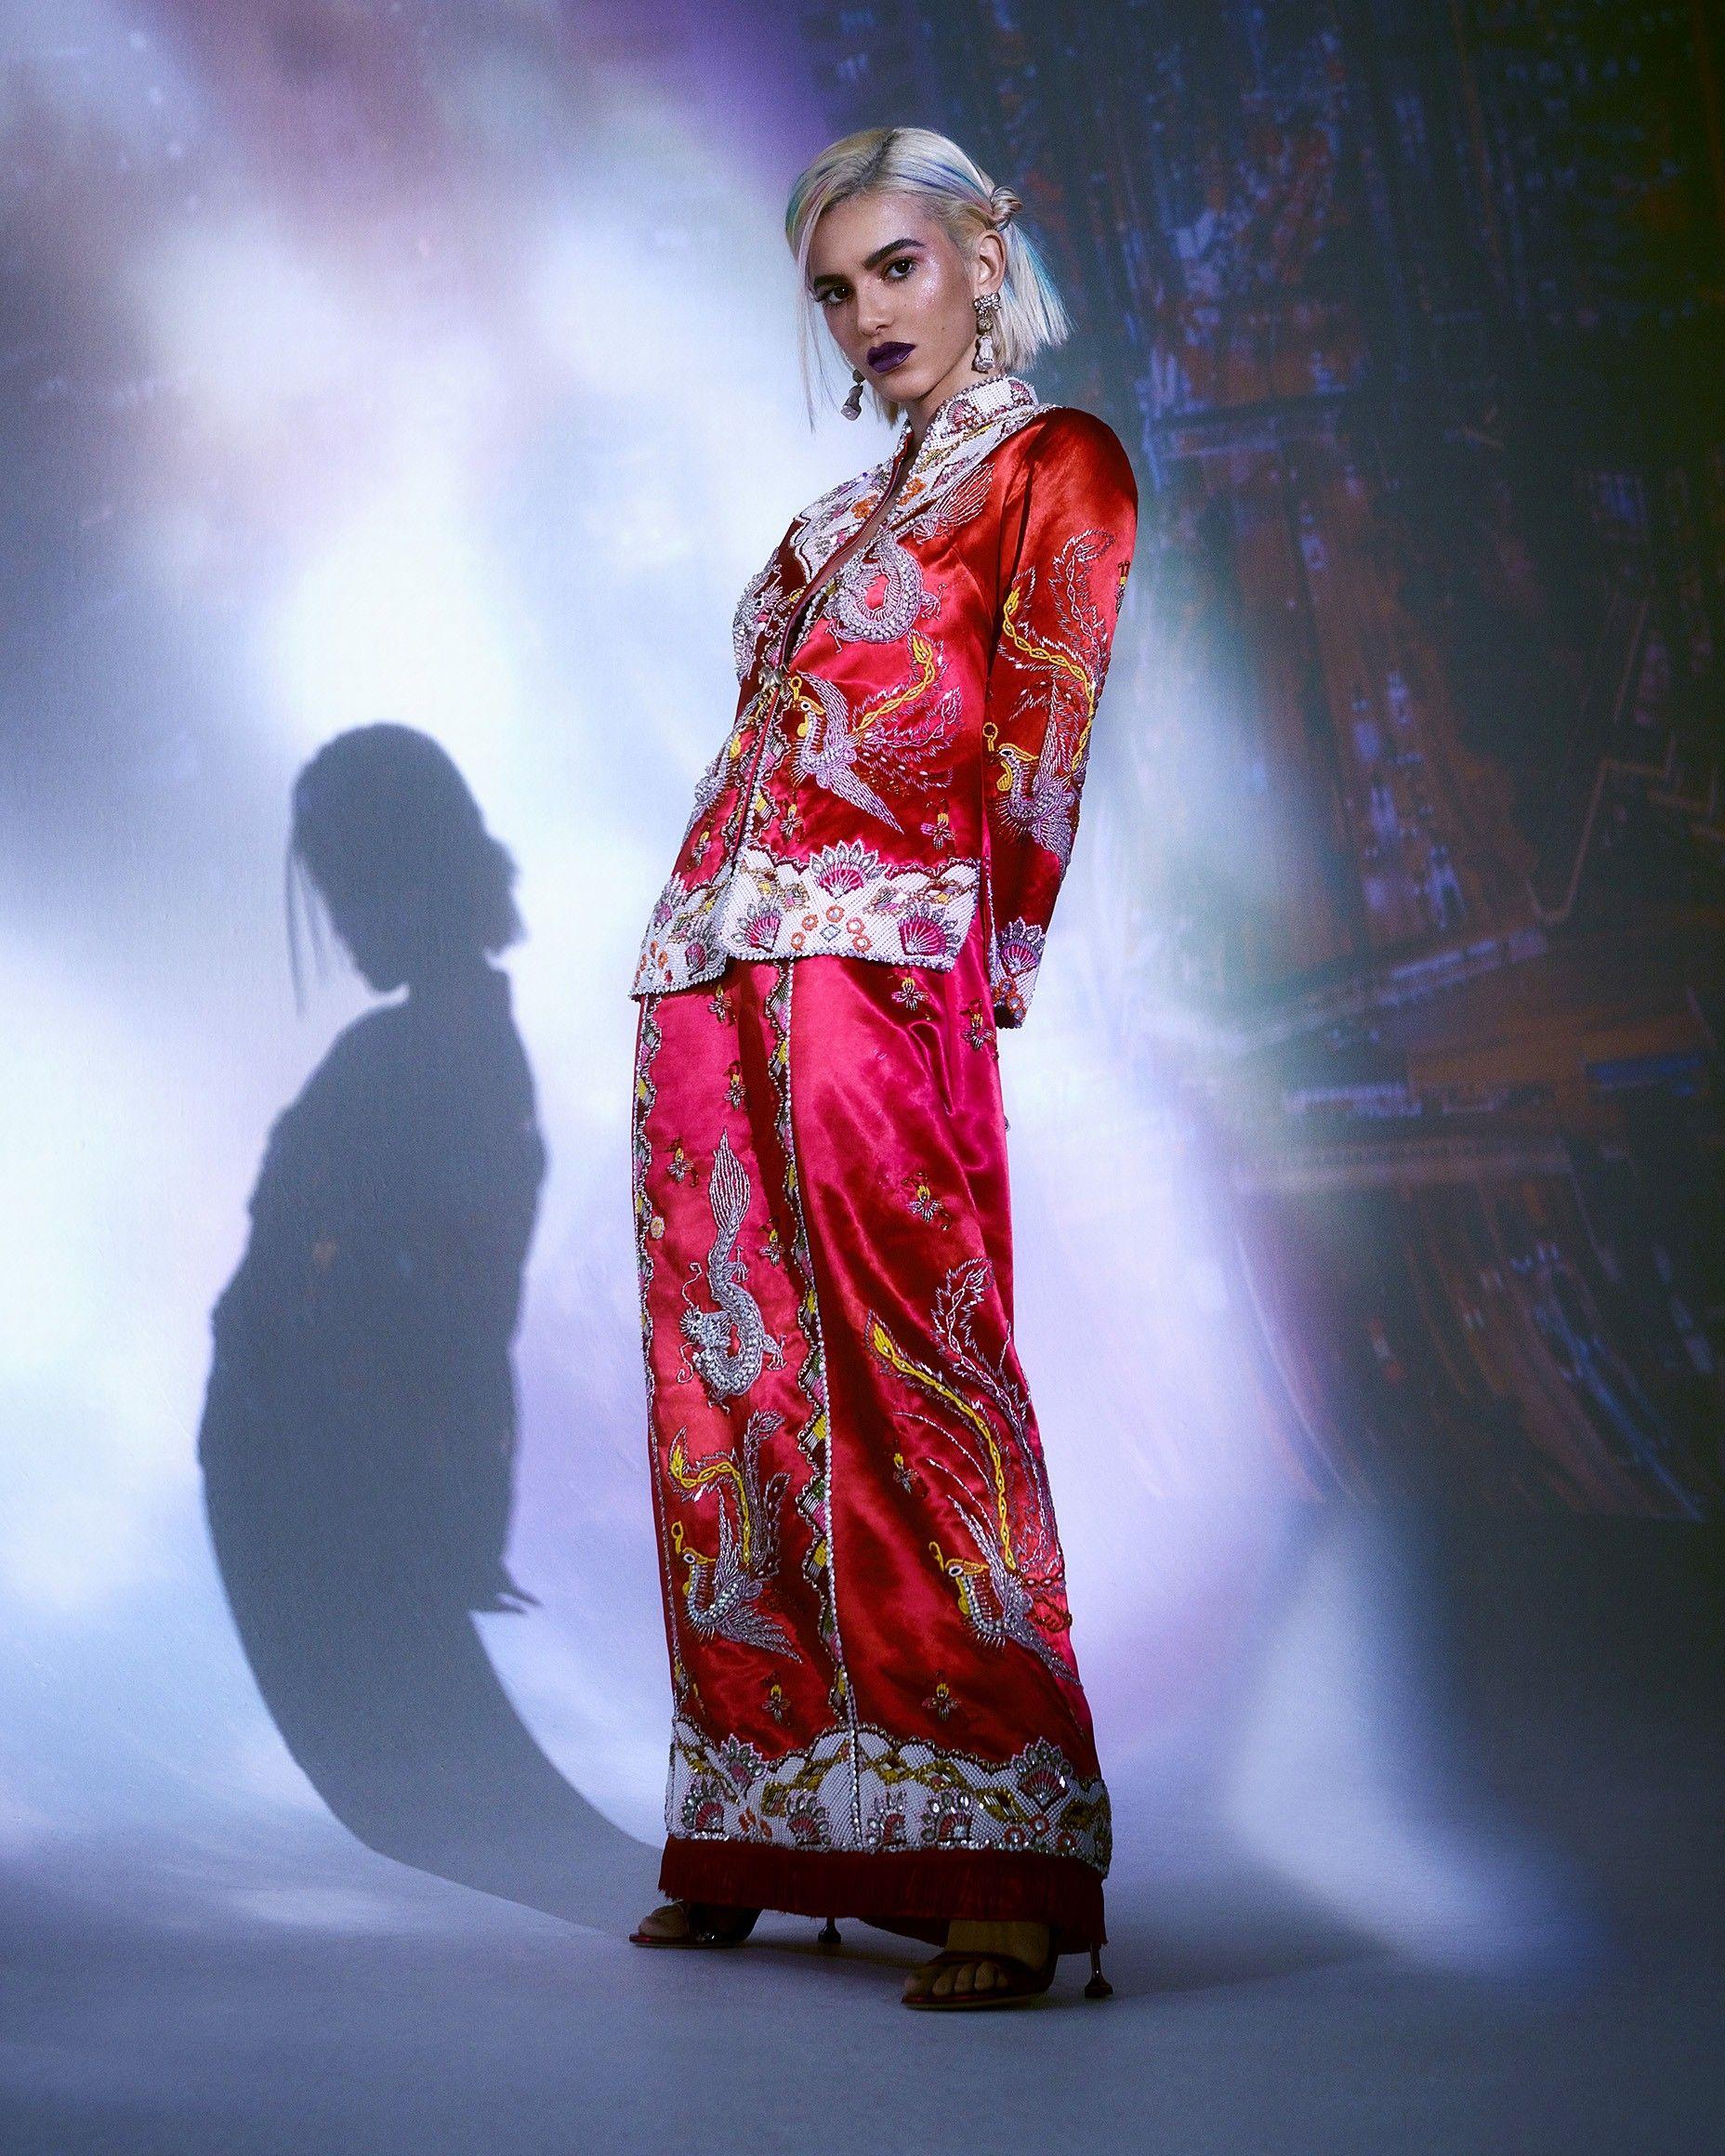 Manu Gavassi Usa Look Inspirado No Tiktok Para Apresentar Mtv Miaw Manu Gavassi Ideias Fashion Looks